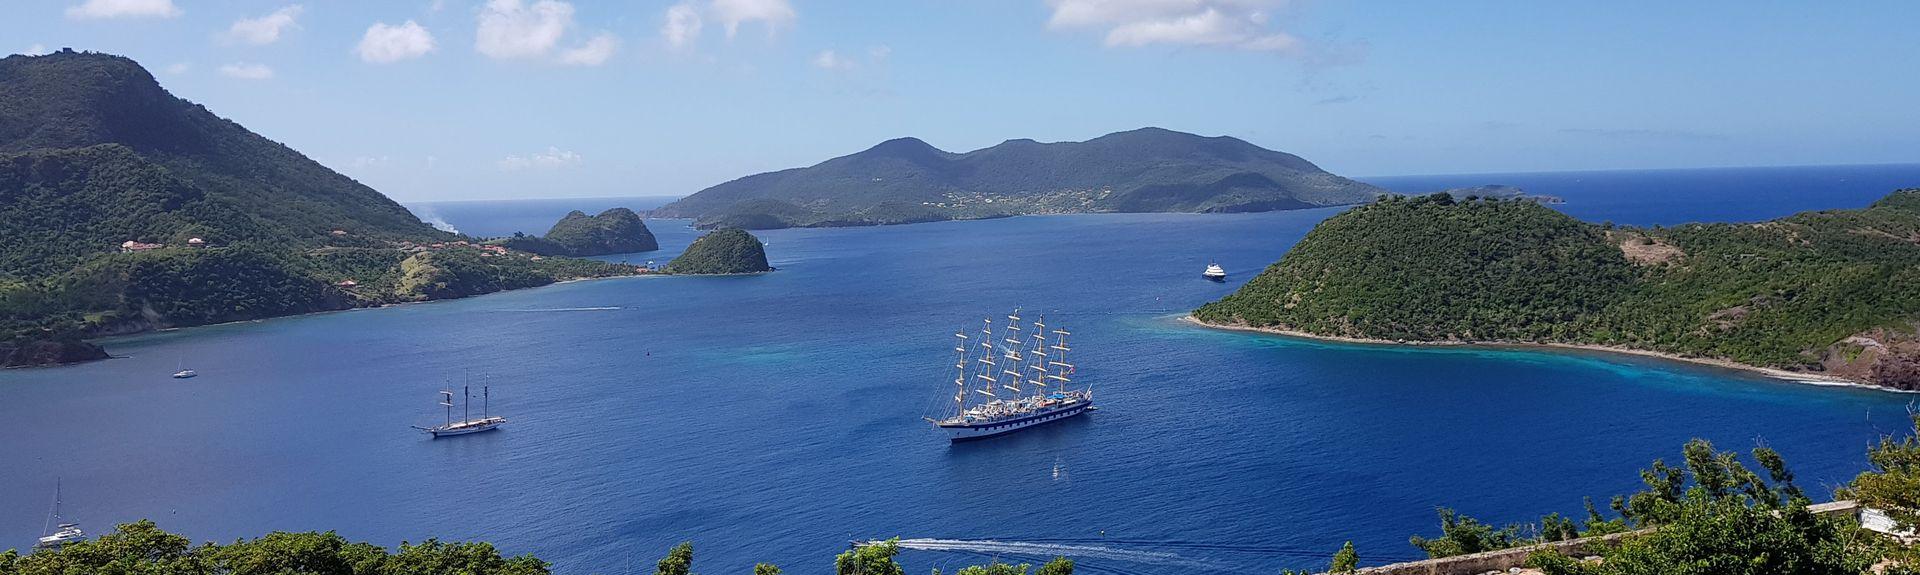 Duzer, Guadeloupe